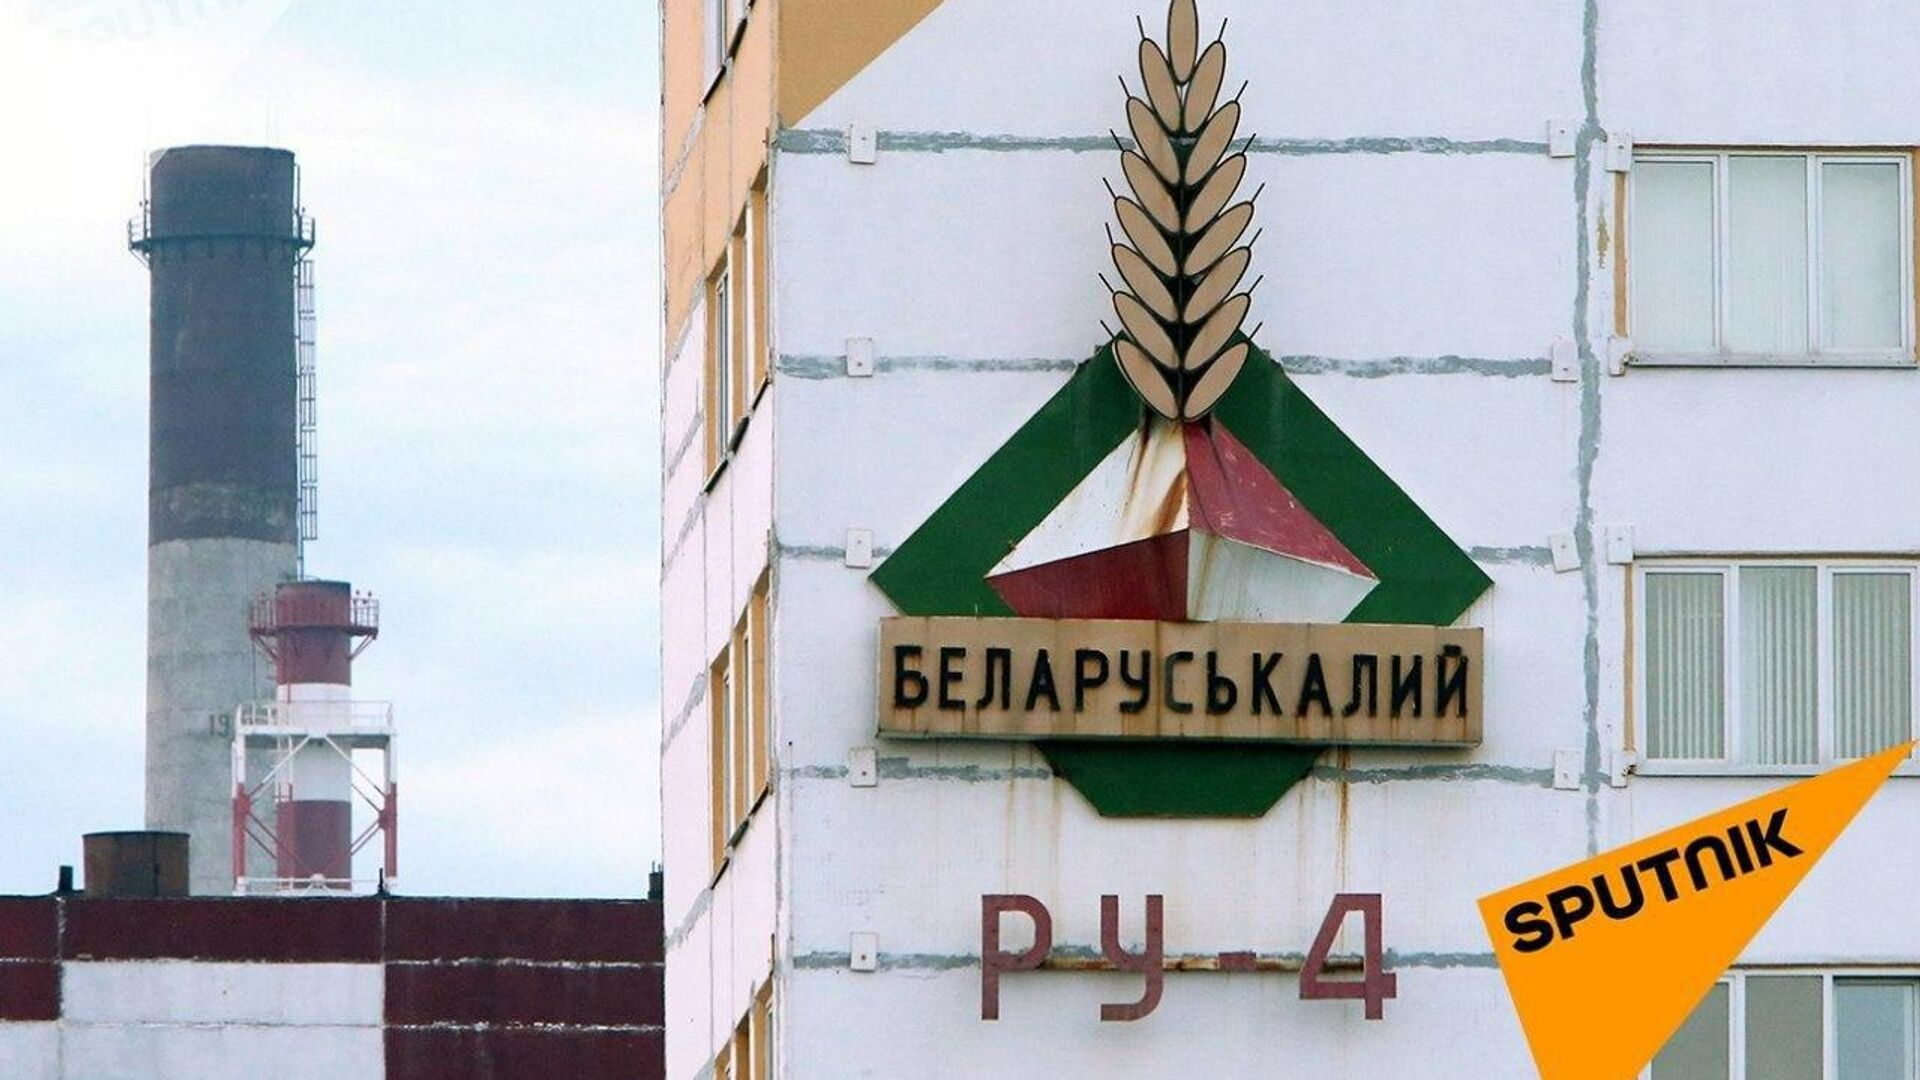 Беларуськалий - РИА Новости, 1920, 12.09.2020